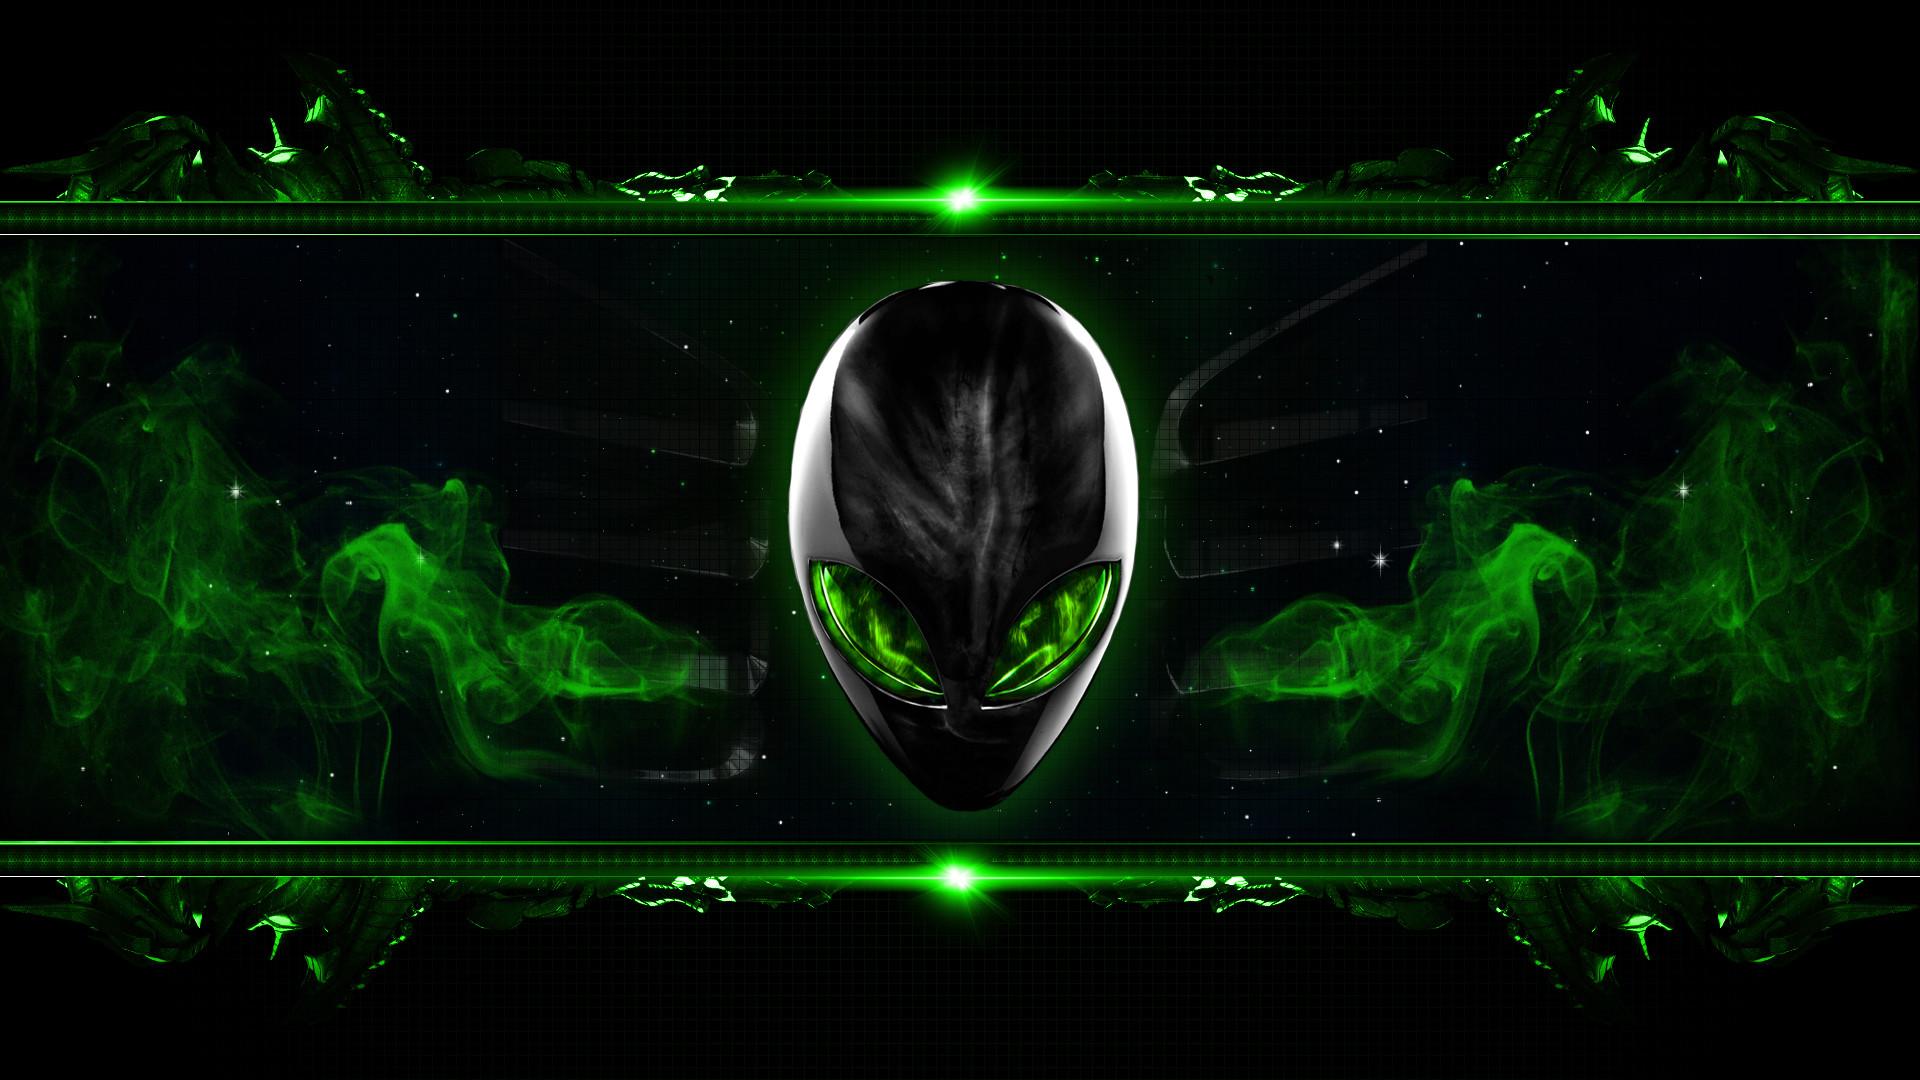 Berühmt Alienware Wallpaper HD (79+ images) #VF_08